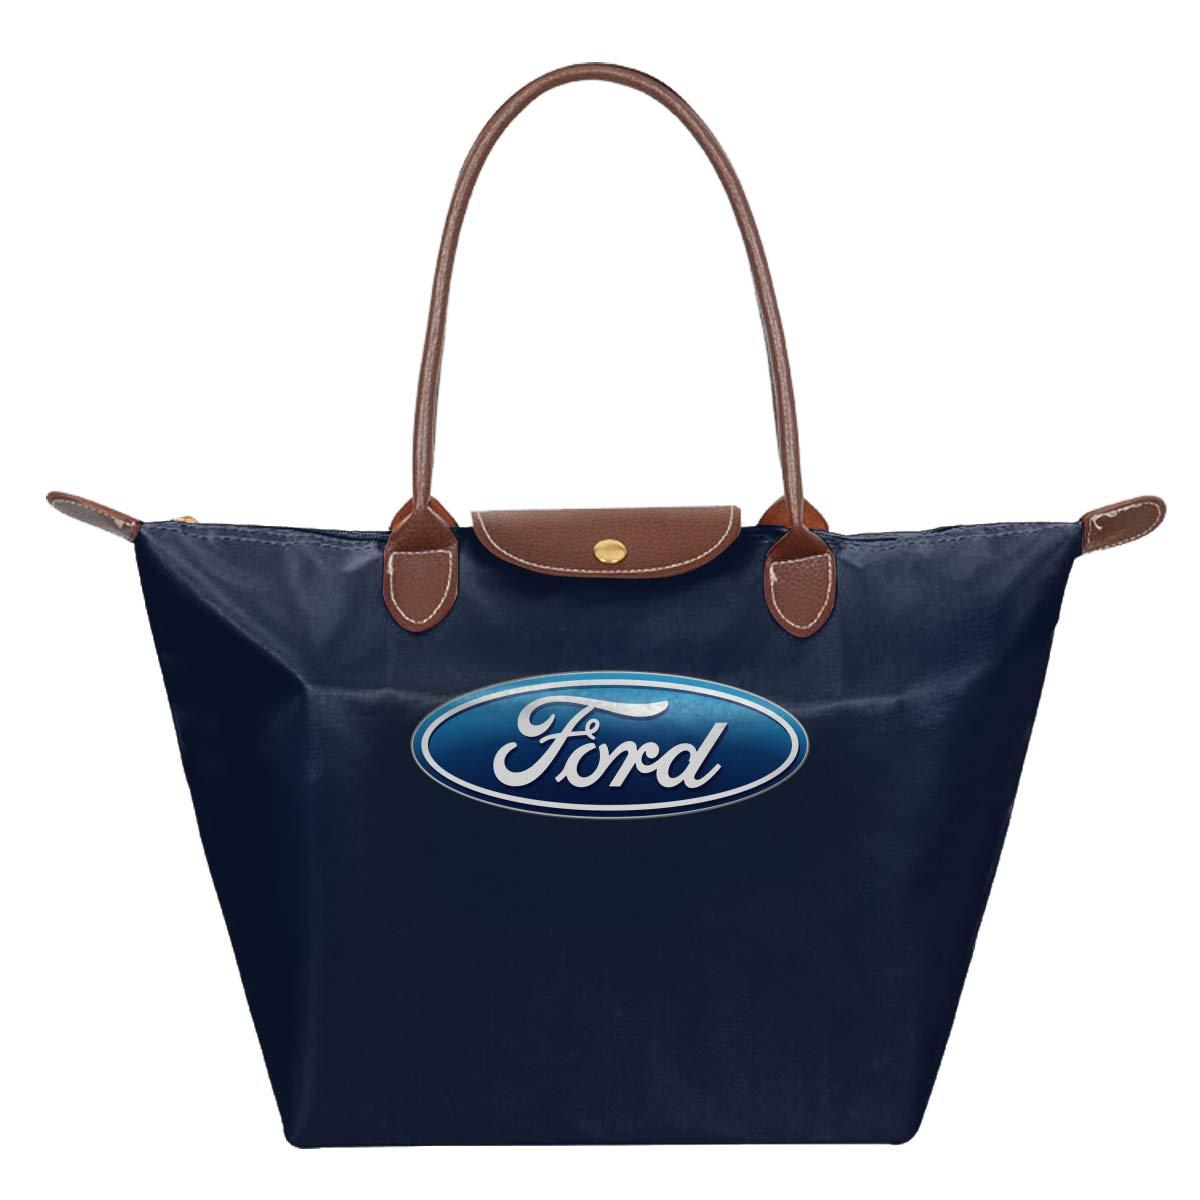 Ford Logo Waterproof Leather Folded Messenger Nylon Bag Travel Tote Hopping Folding School Handbags